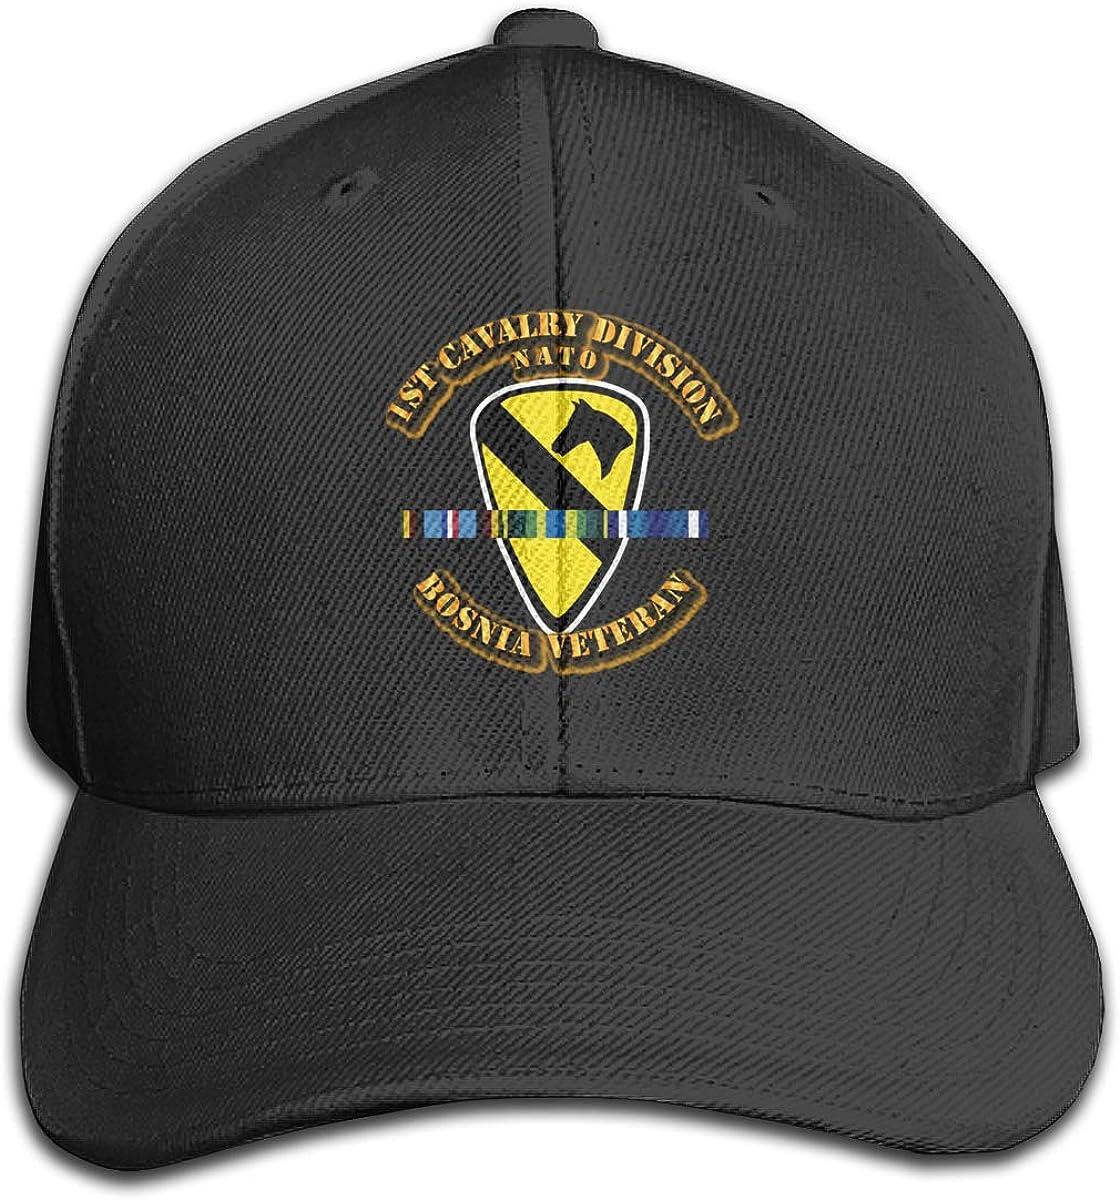 Zdsg 1st Cavalry Division W Bosnia SVC Ribbons Dad Hat Unisex Cotton Hat Adjustable Baseball Cap